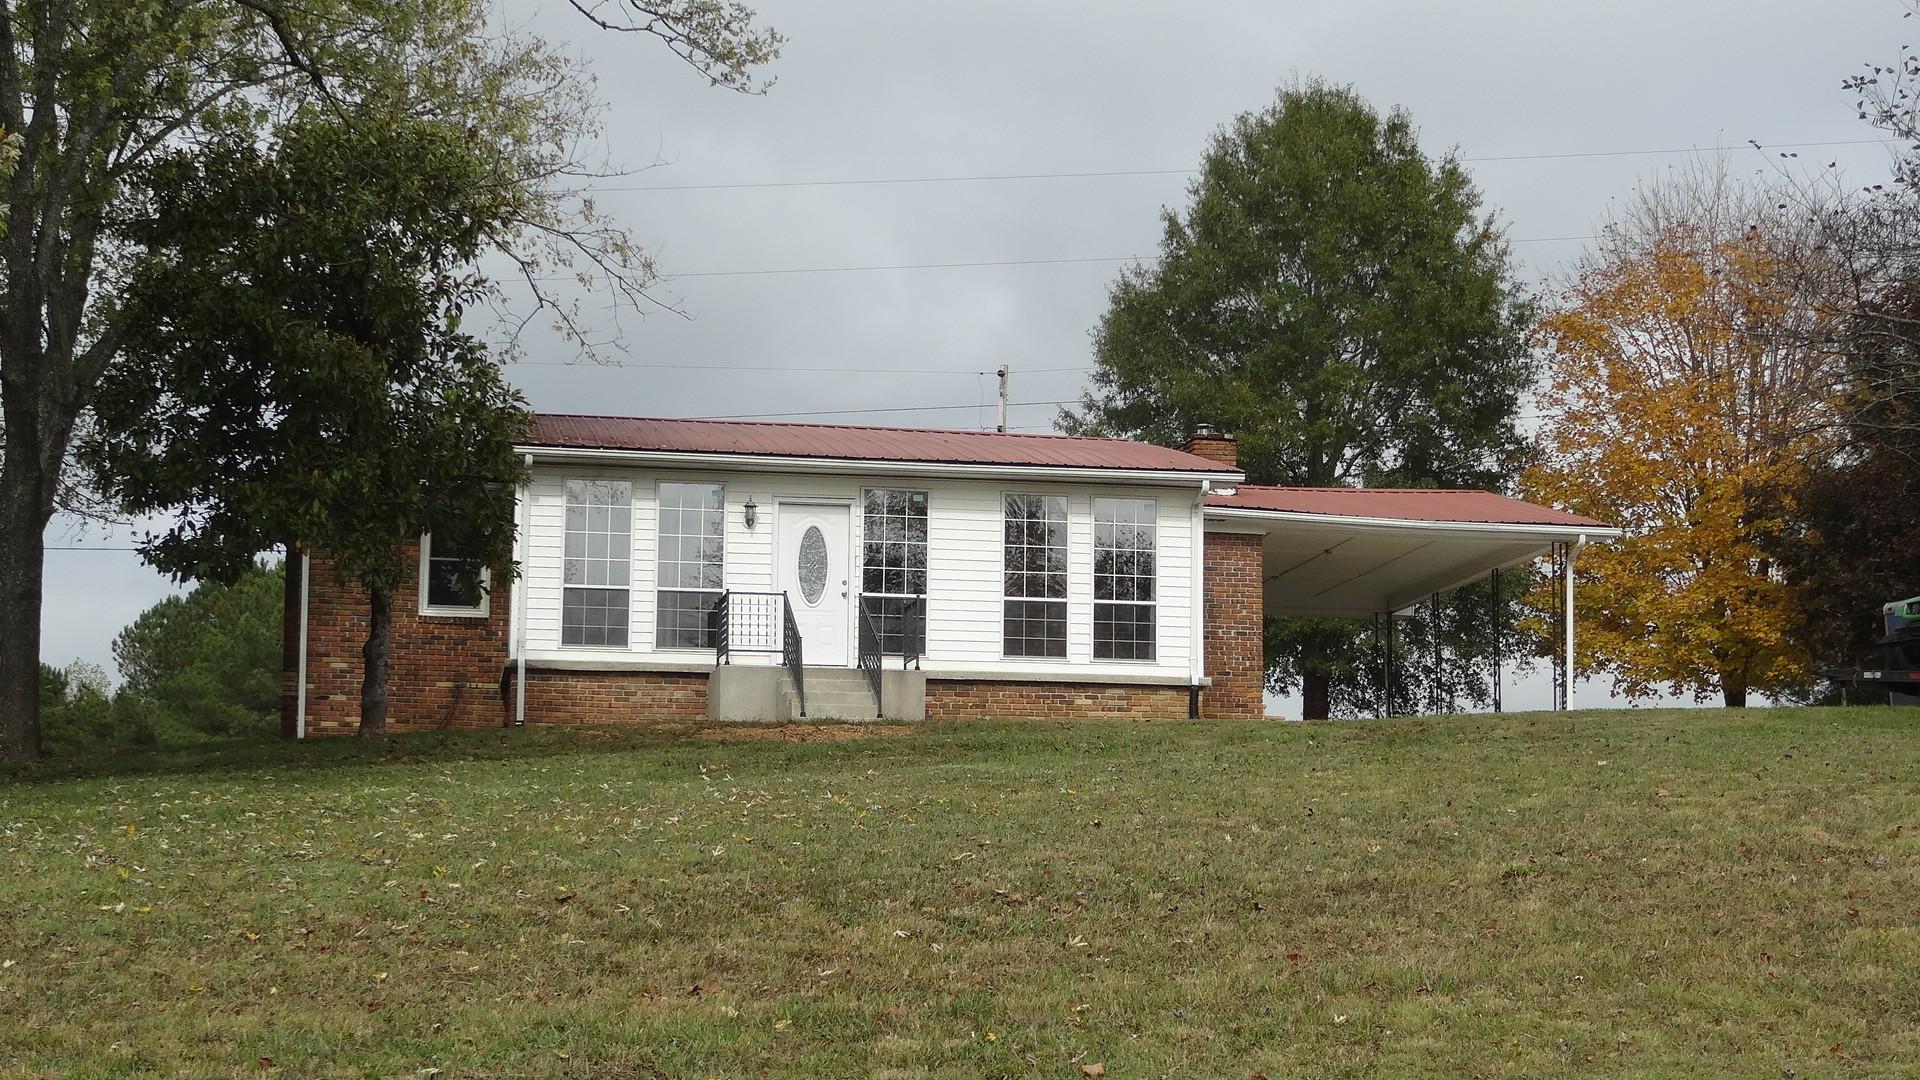 467 Oak Grove Rd, Mc Minnville, TN 37110 - Mc Minnville, TN real estate listing